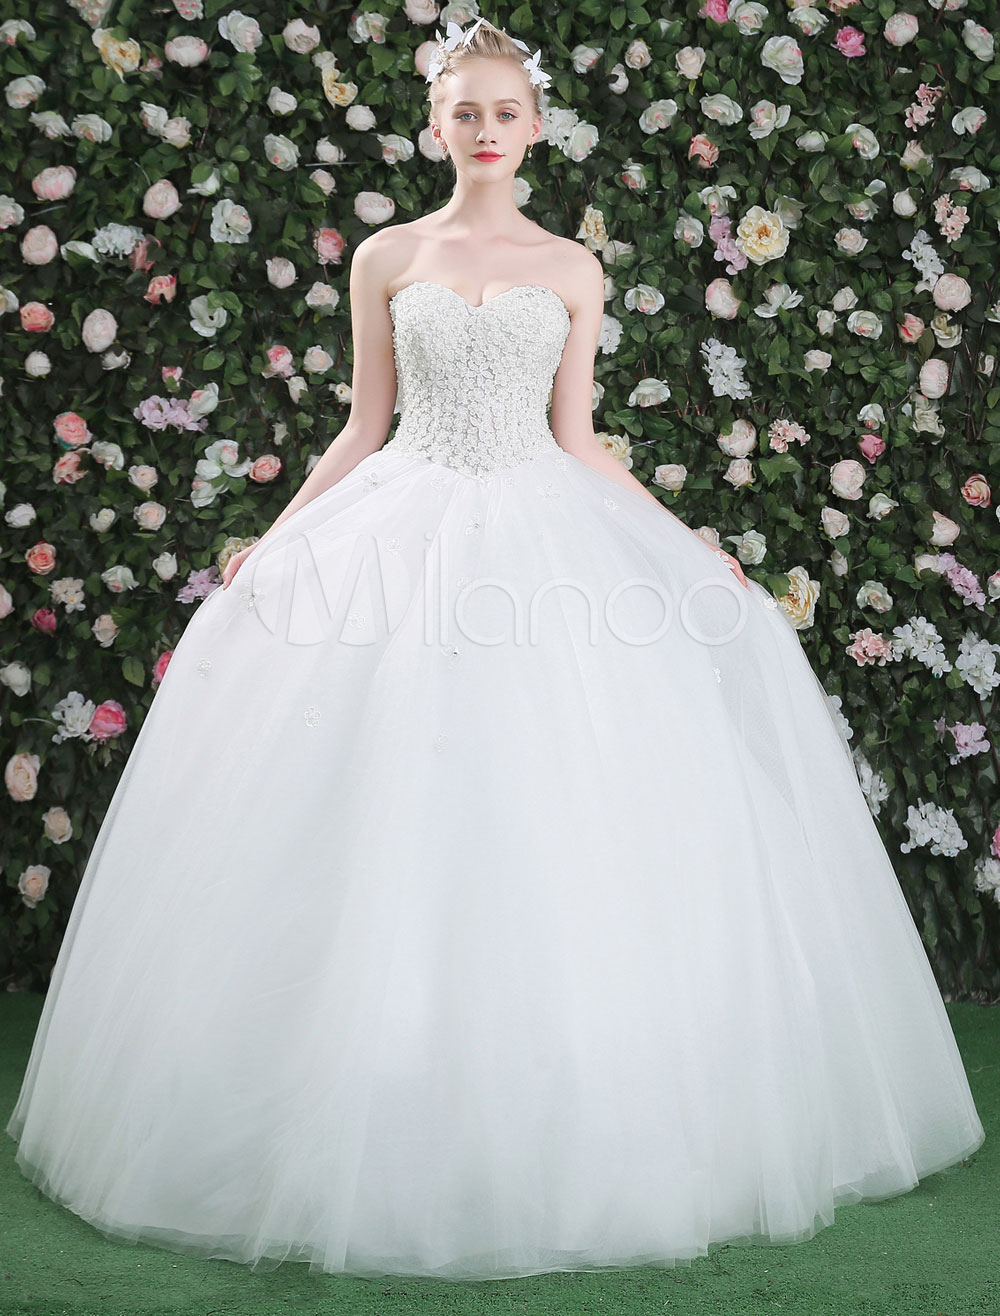 princesse robe de mari e princesse encolure en coeur avec. Black Bedroom Furniture Sets. Home Design Ideas